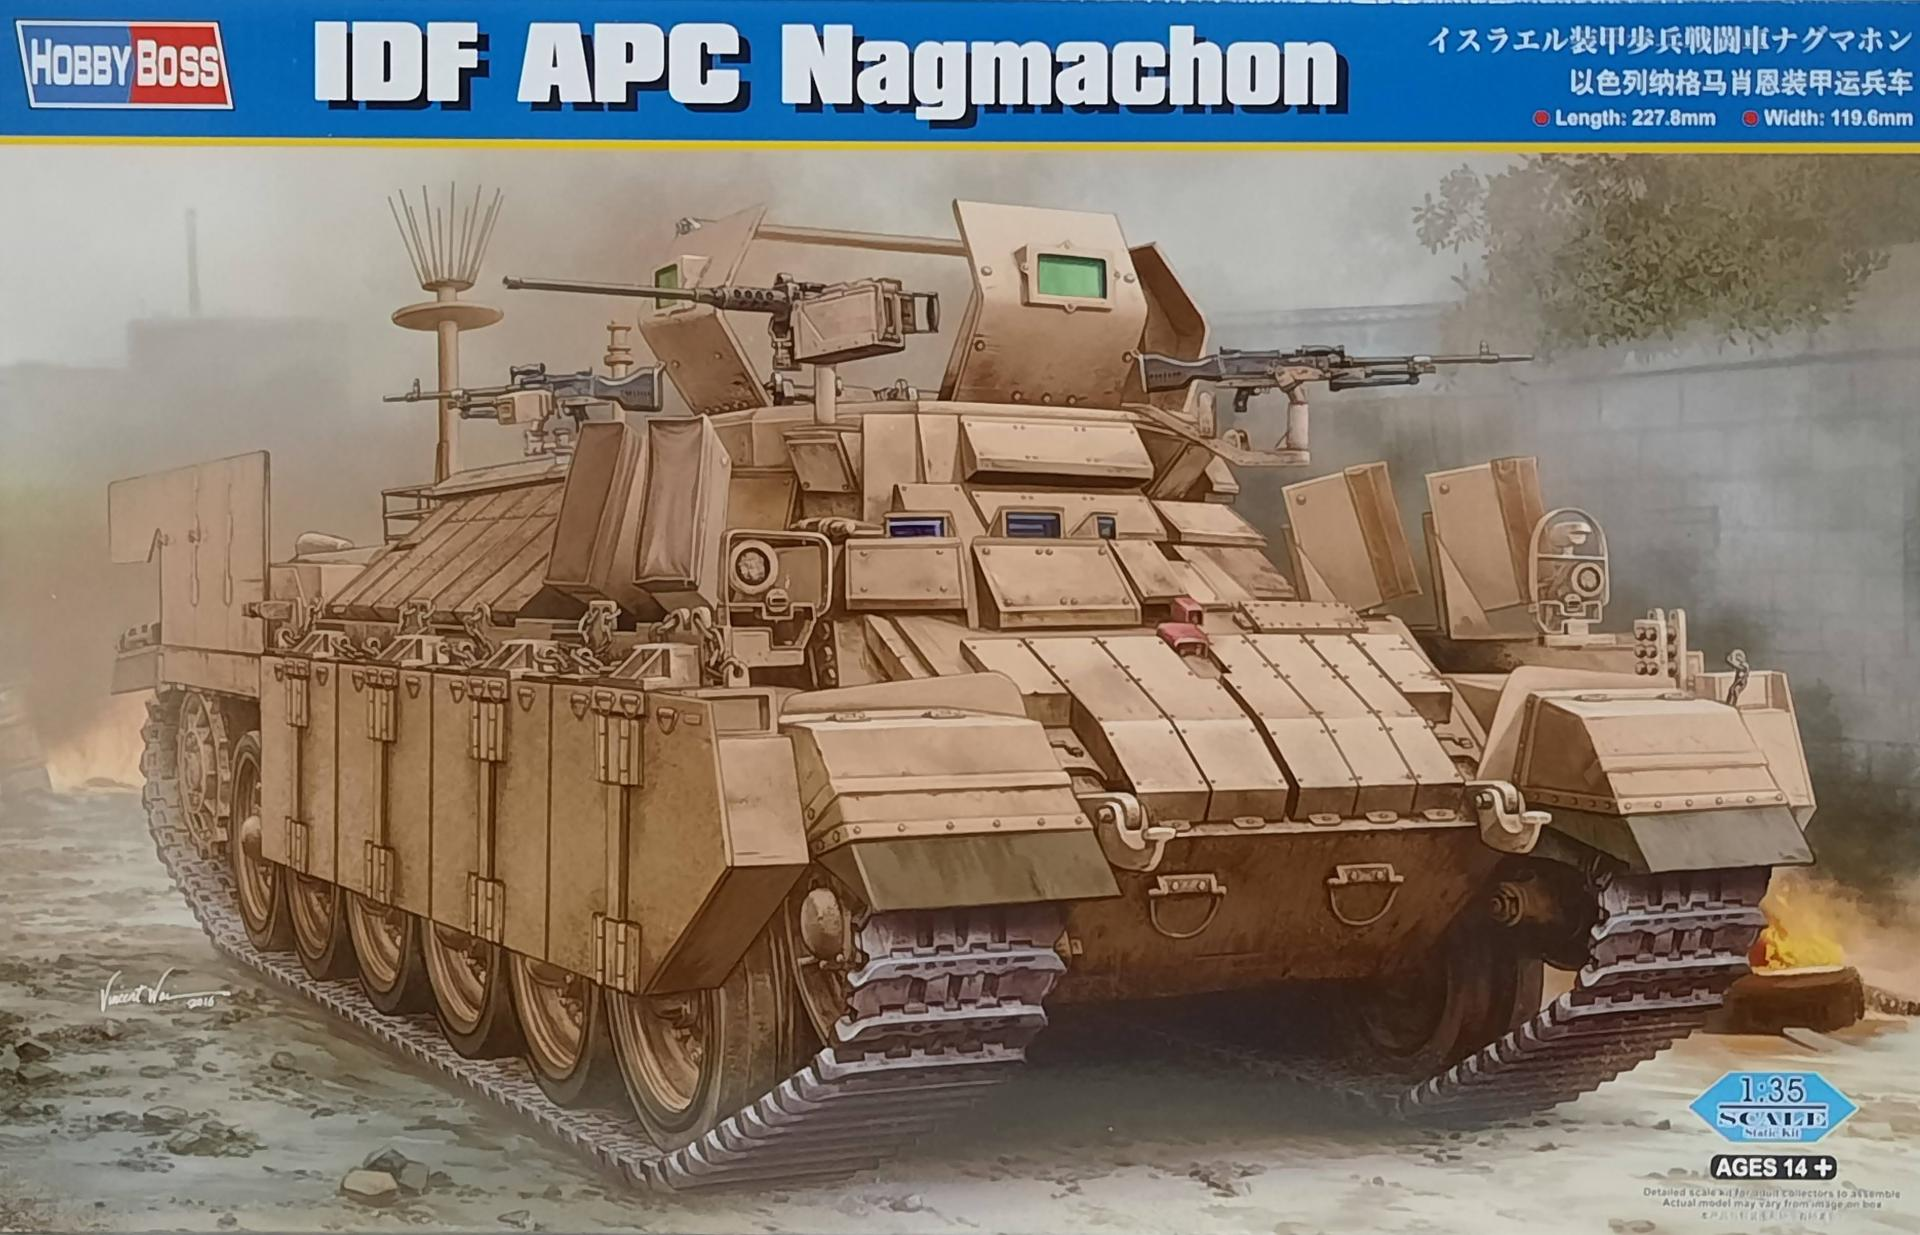 1/35 IDF APC Nagmachon